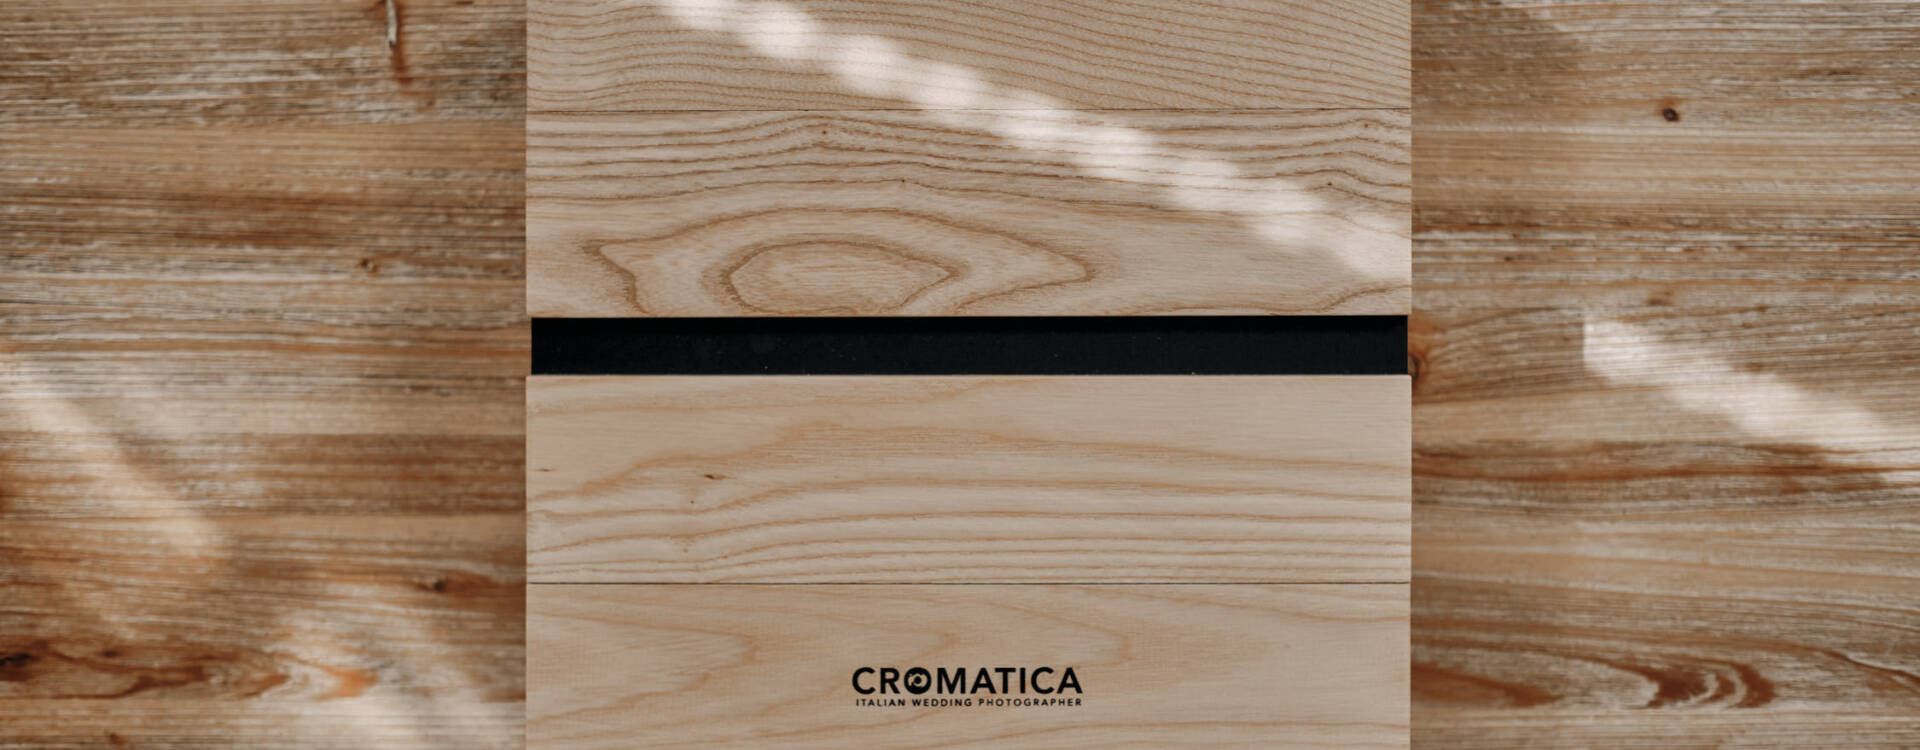 Cromatica Wedding box